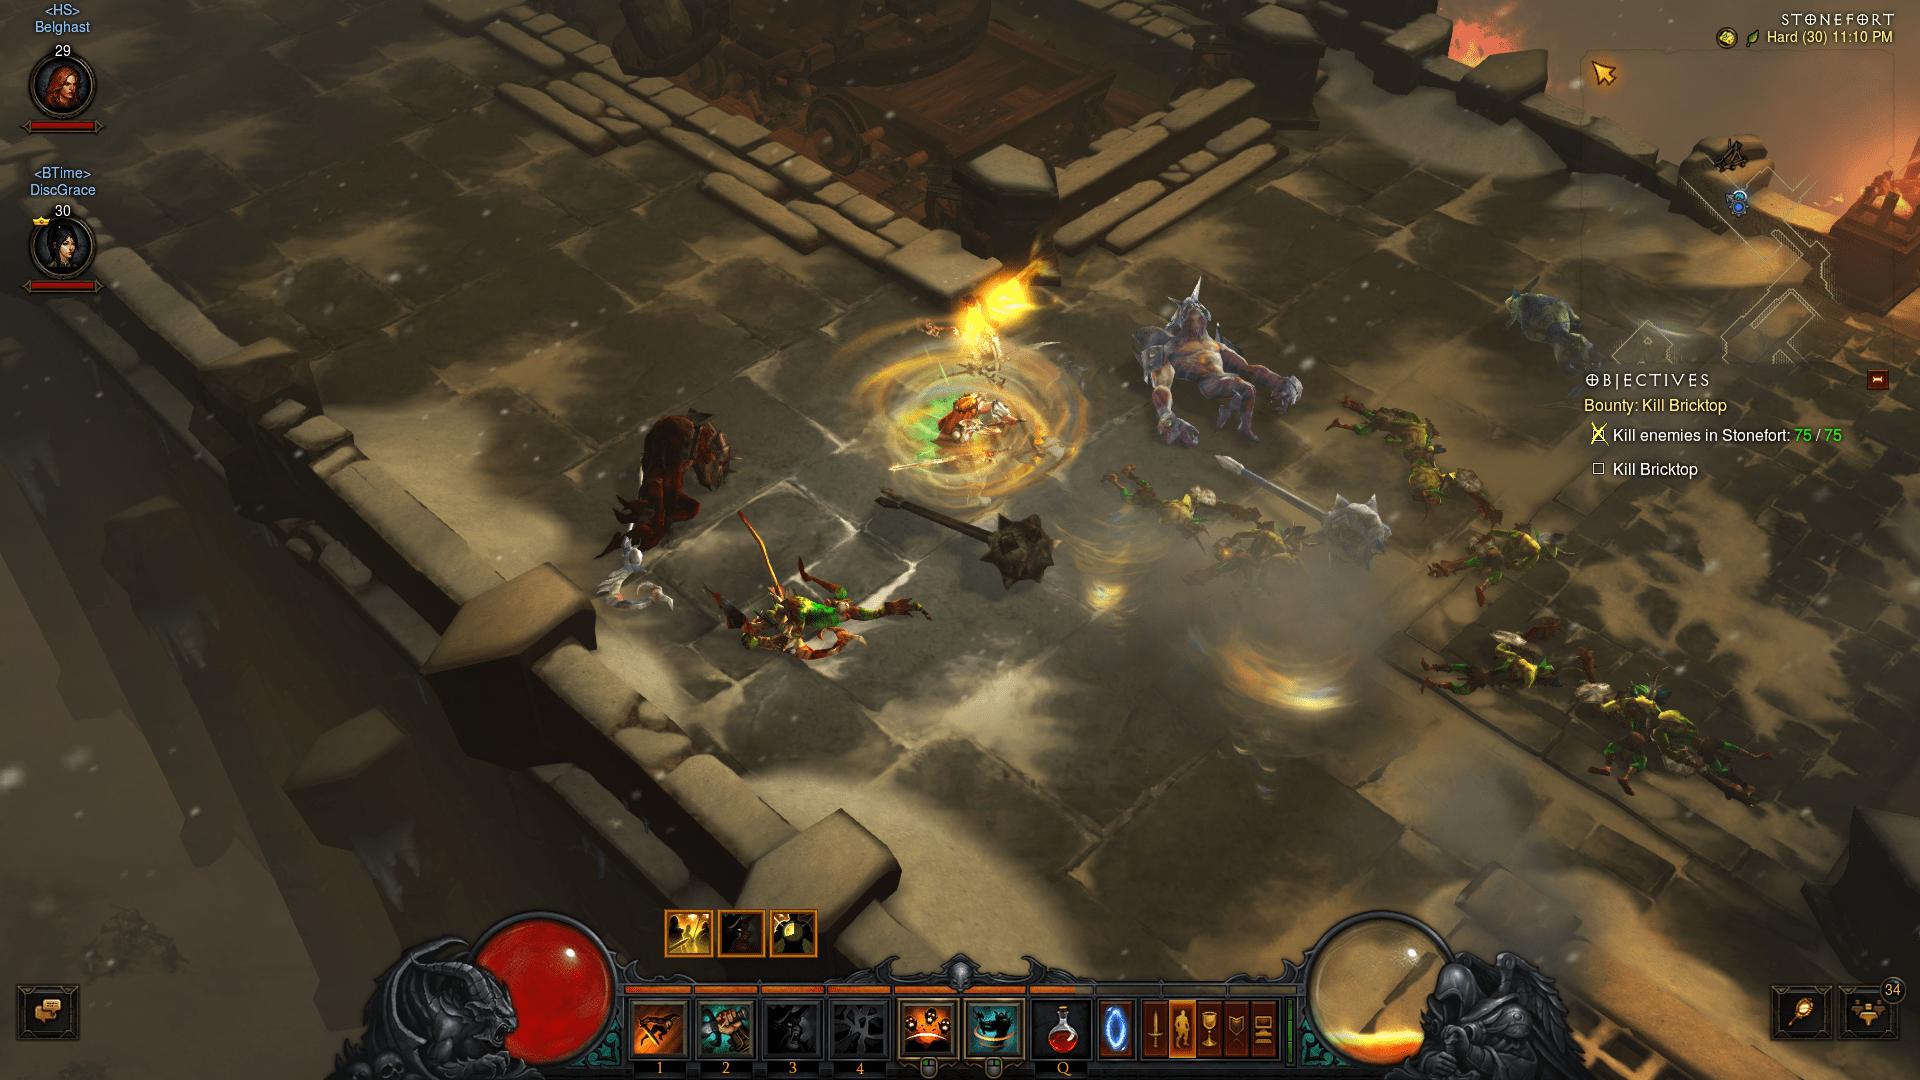 Diablo III 2015-08-28 23-10-17-511